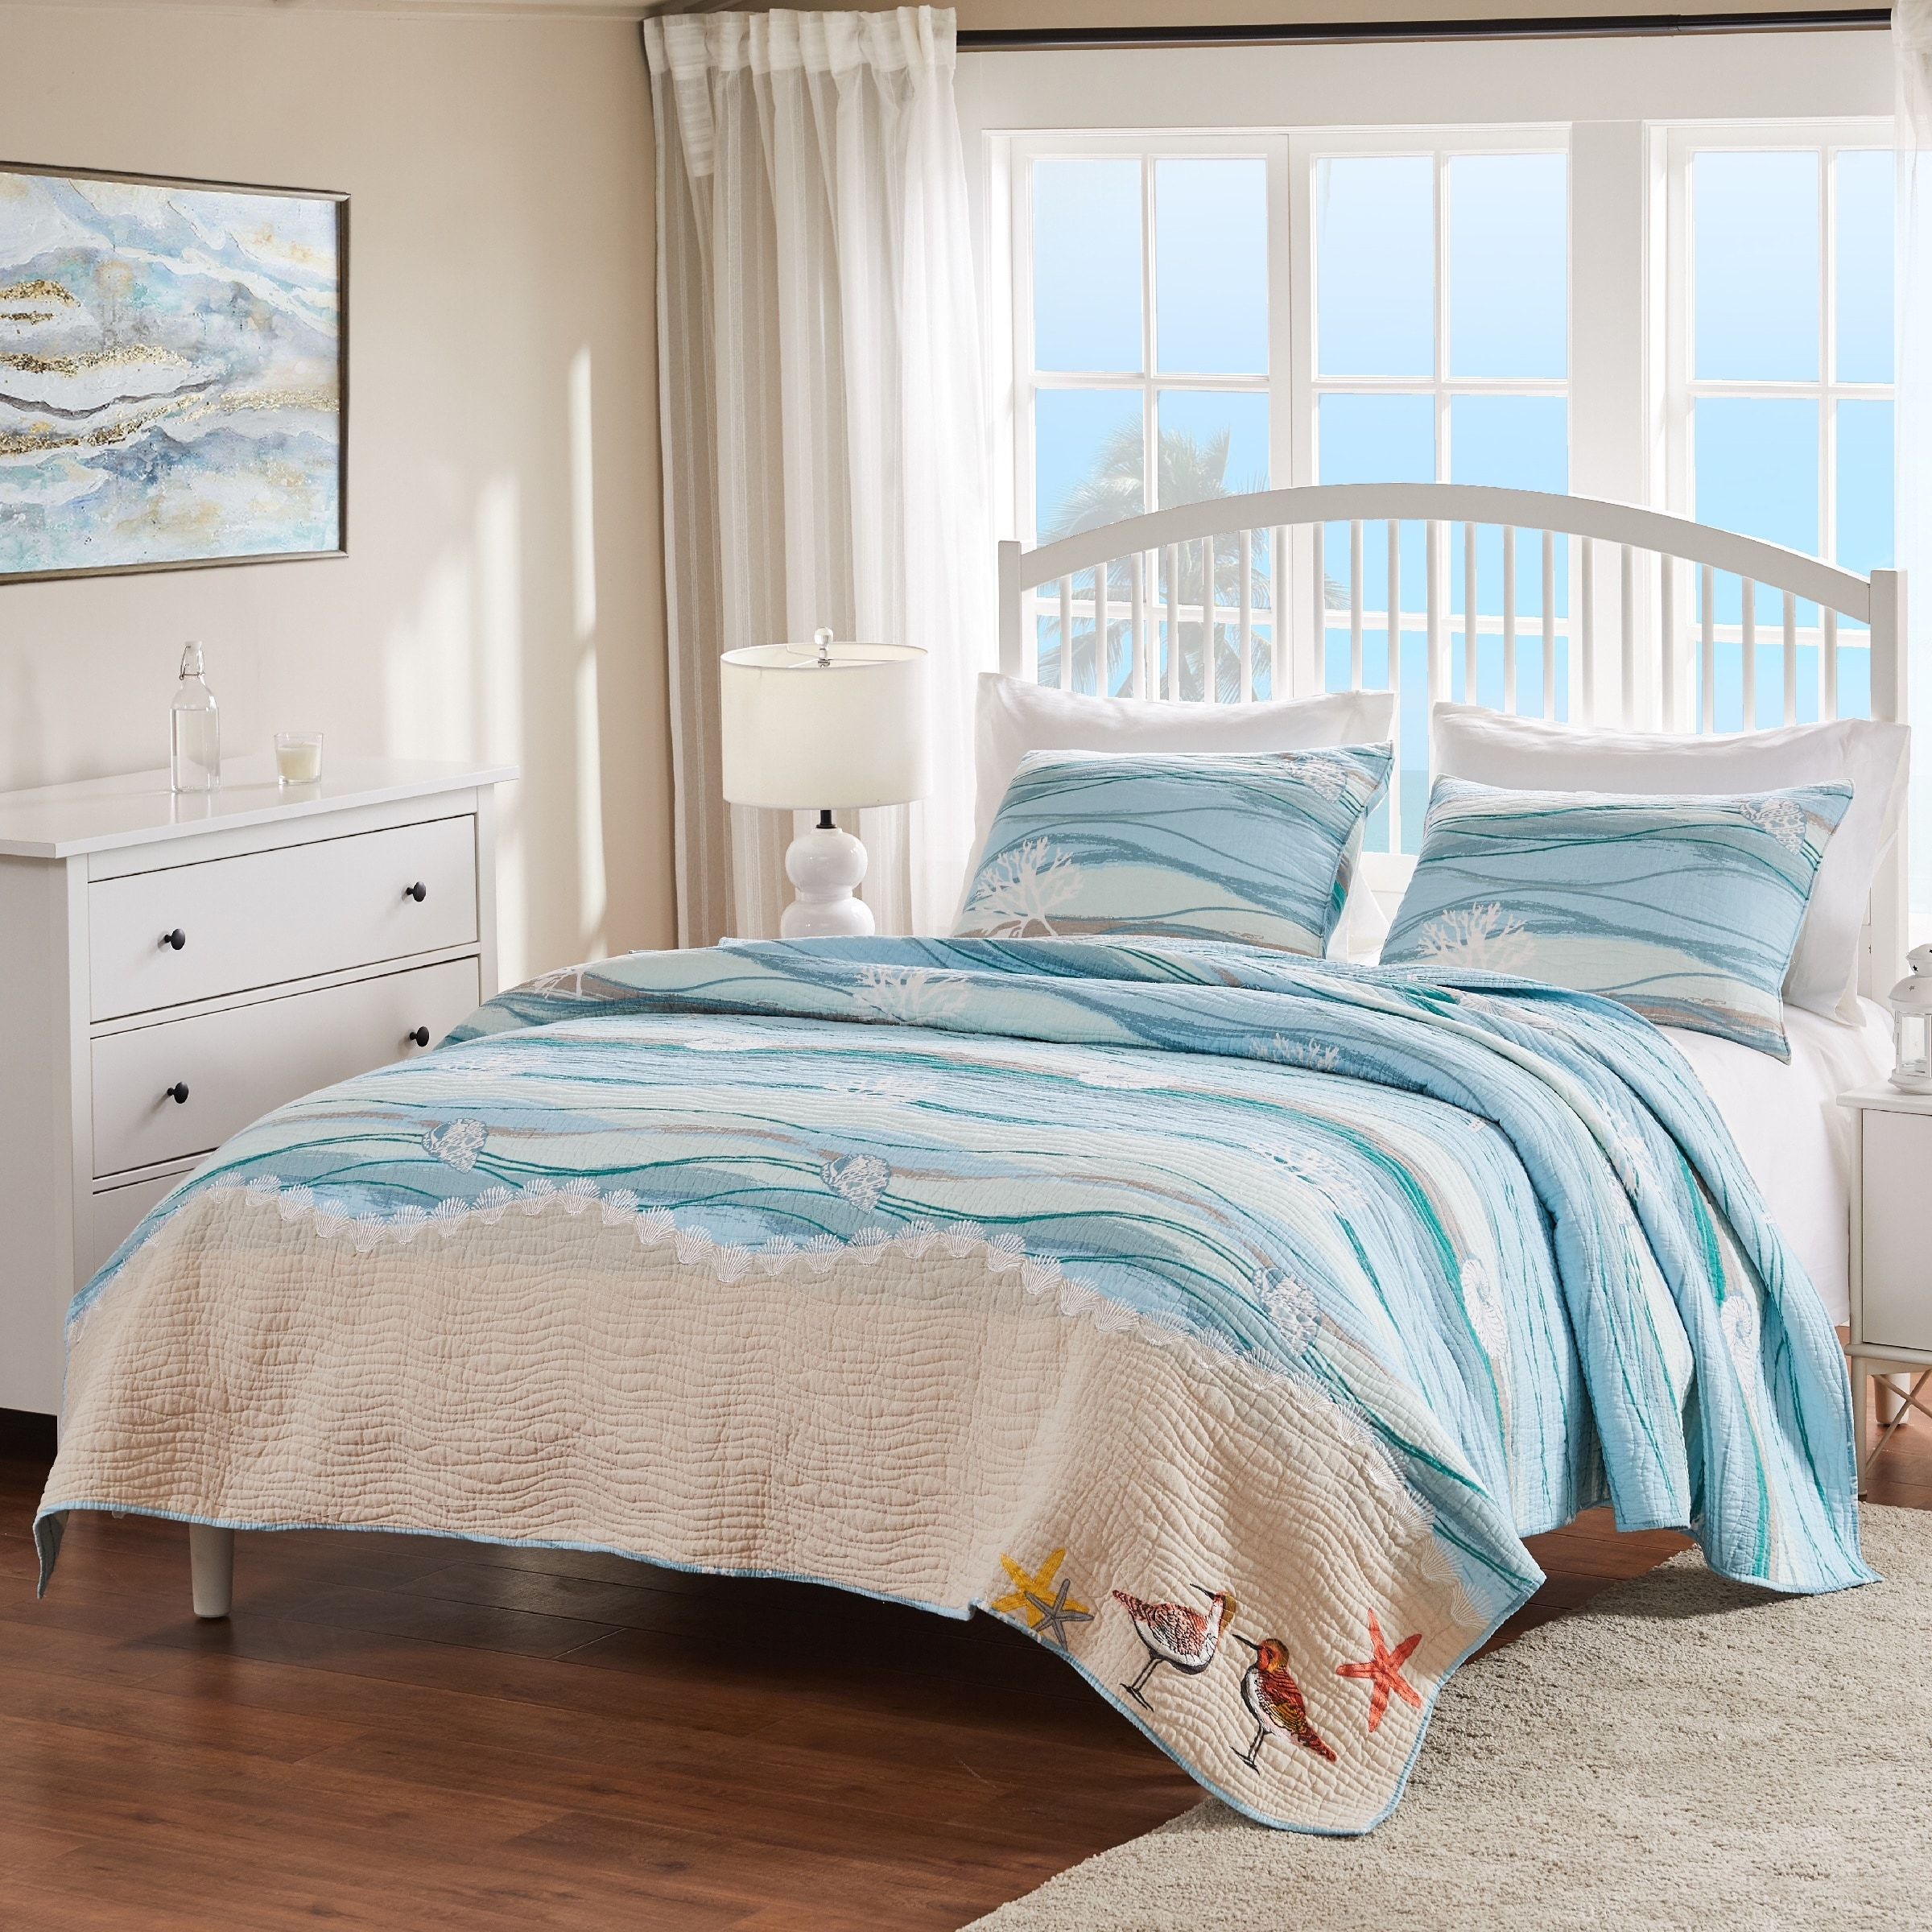 SHELLS AQUA BEACH HOUSE COASTAL COVELET BLUE WATERCOLOR WAVES 6pc QUILT SET